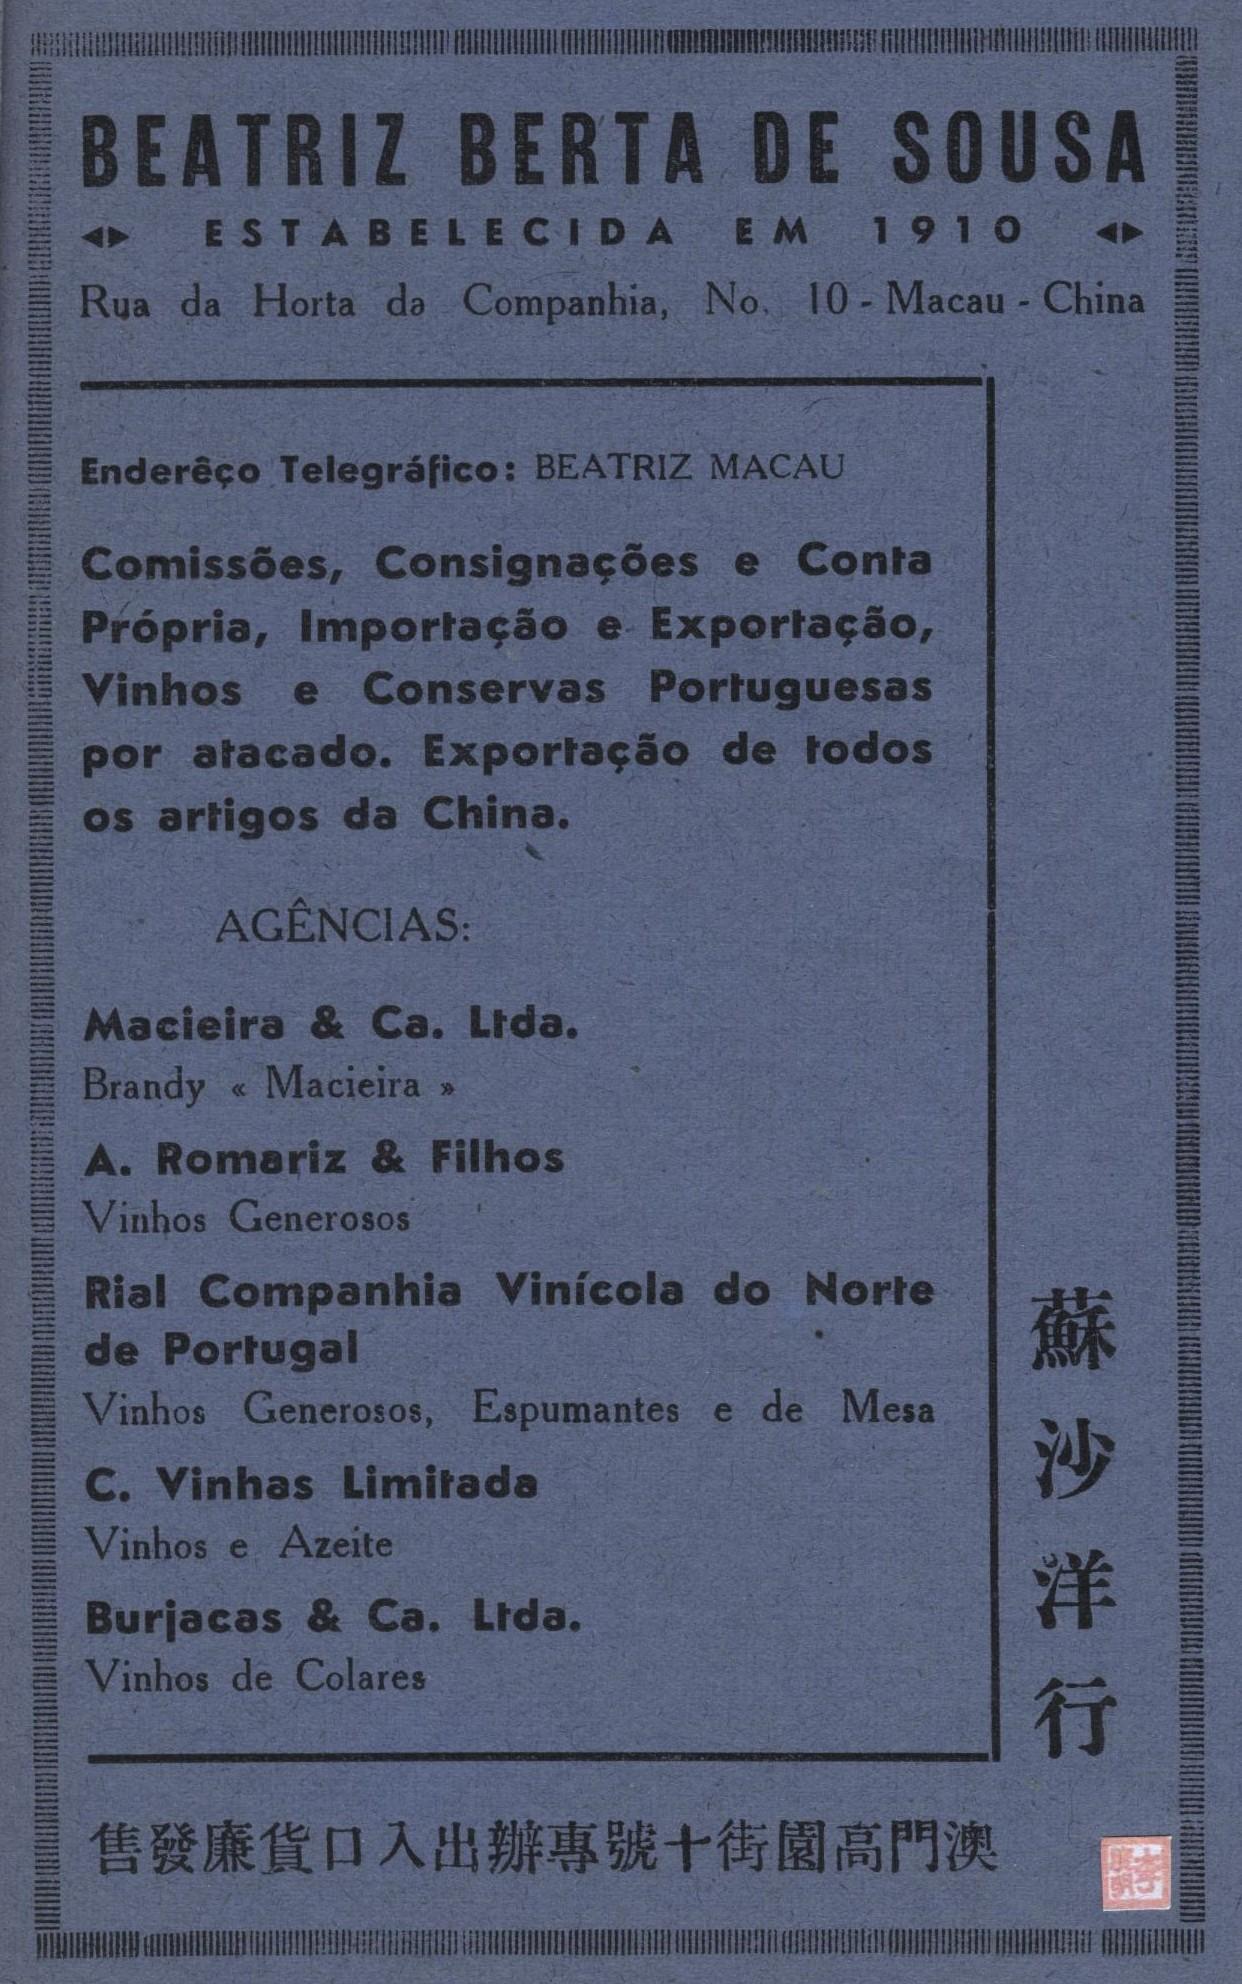 Beatriz Berta de Sousa